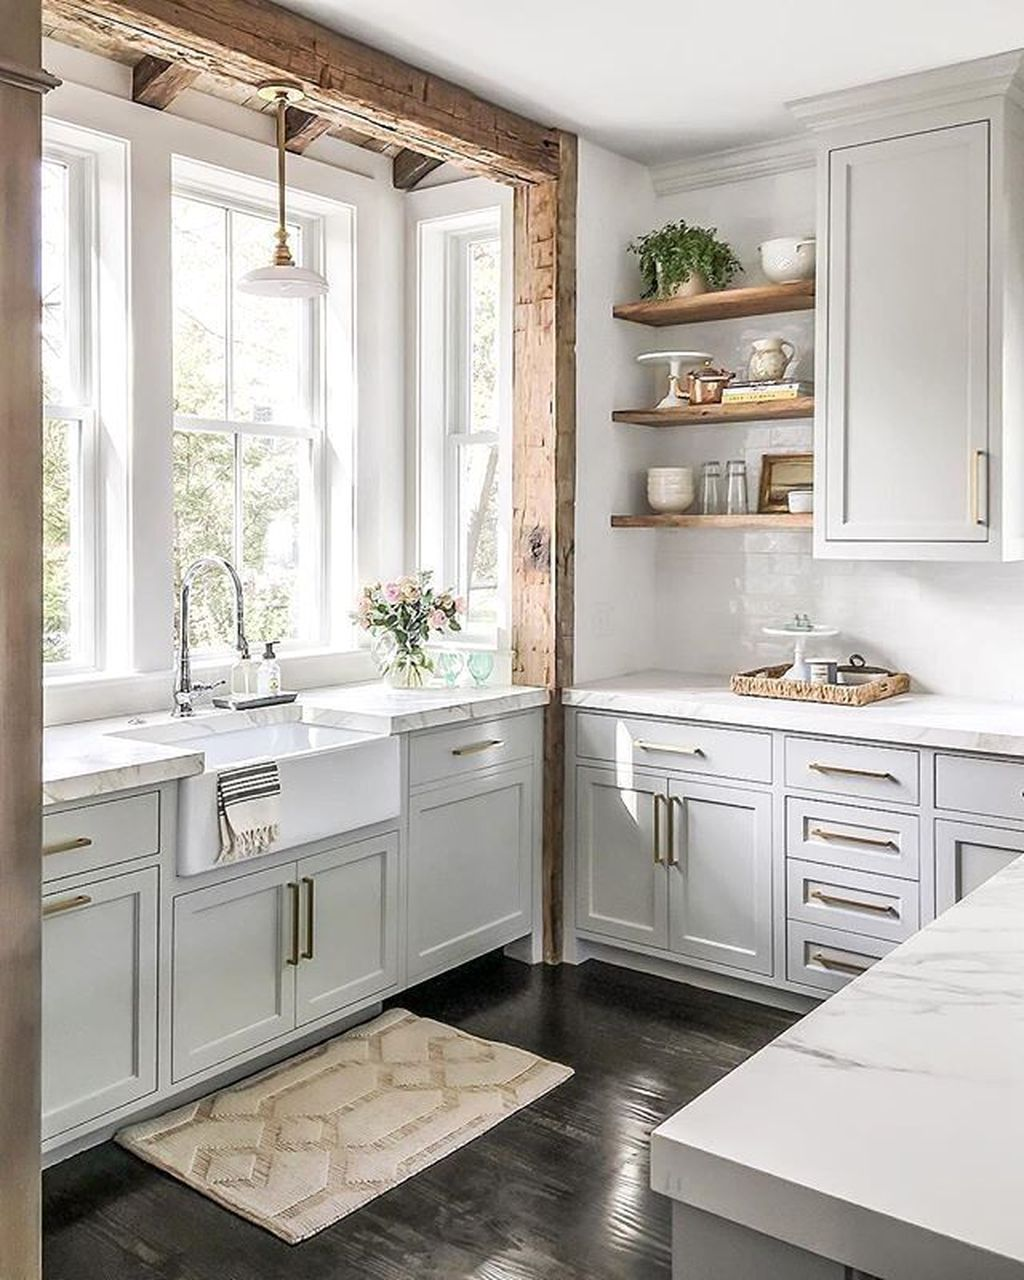 The Best Small Kitchen Design Ideas 28